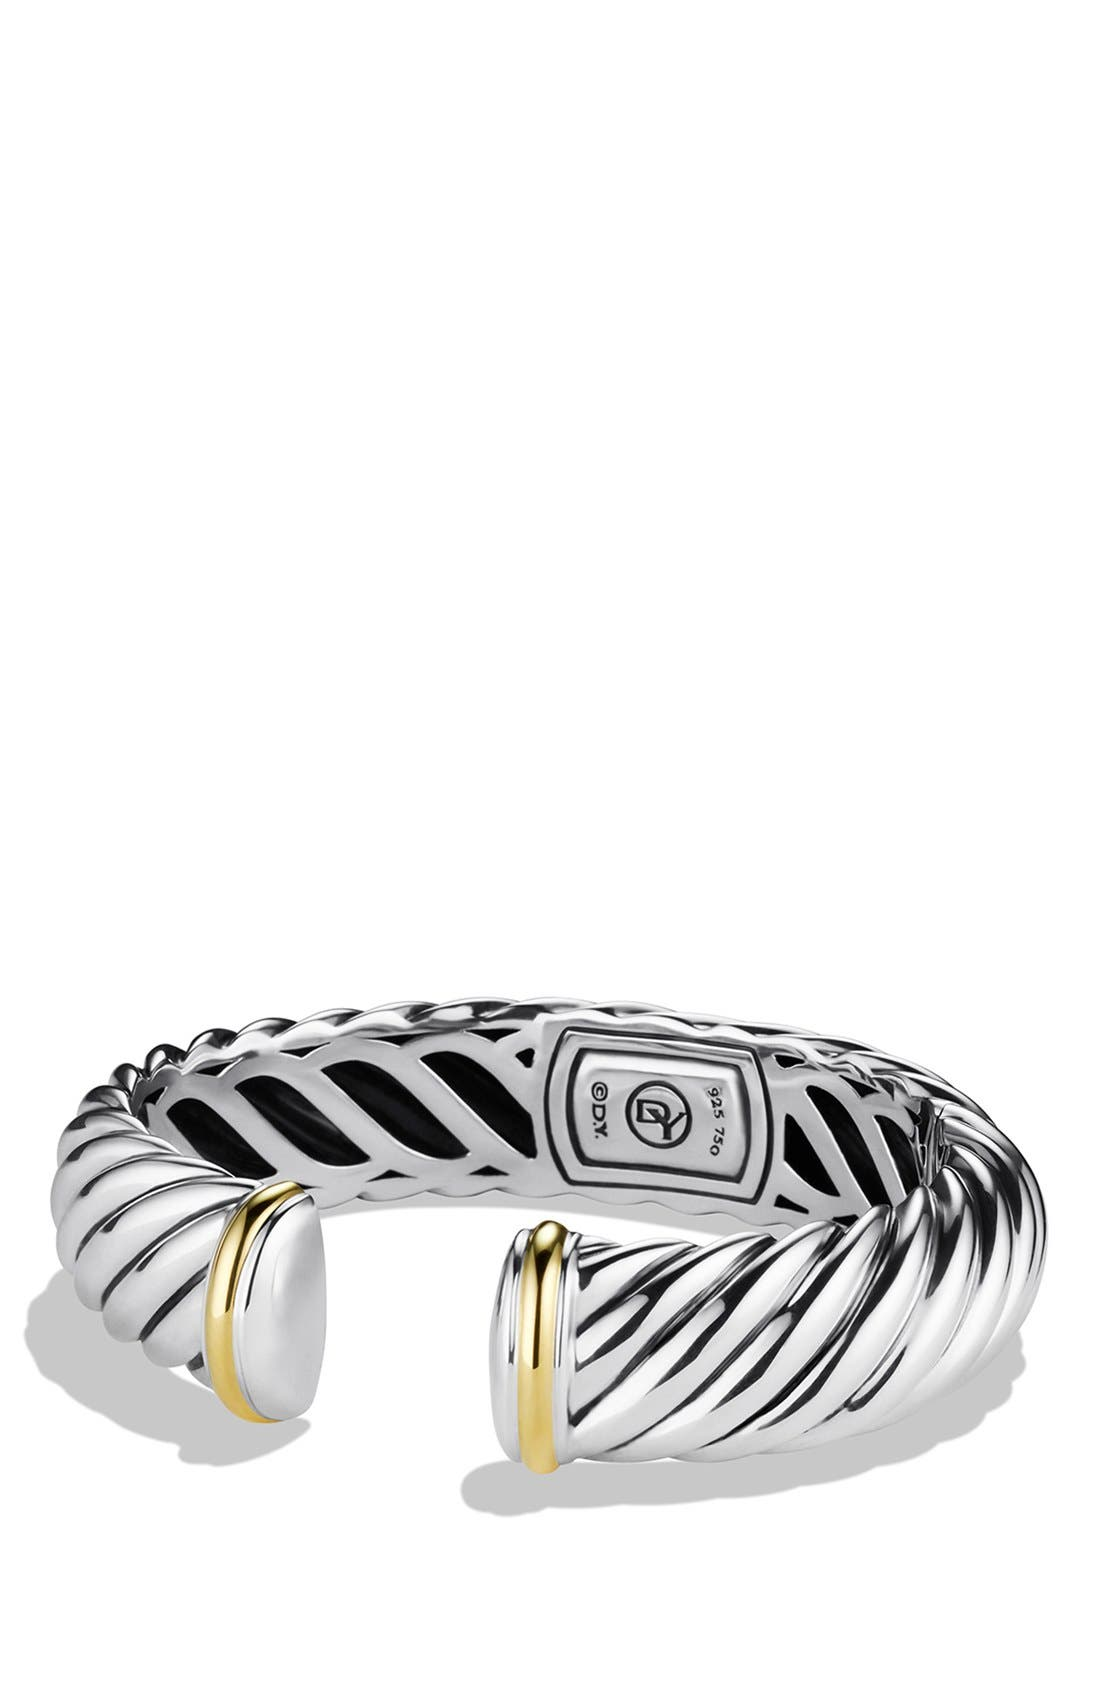 Main Image - David Yurman 'Waverly' Bracelet with Gold